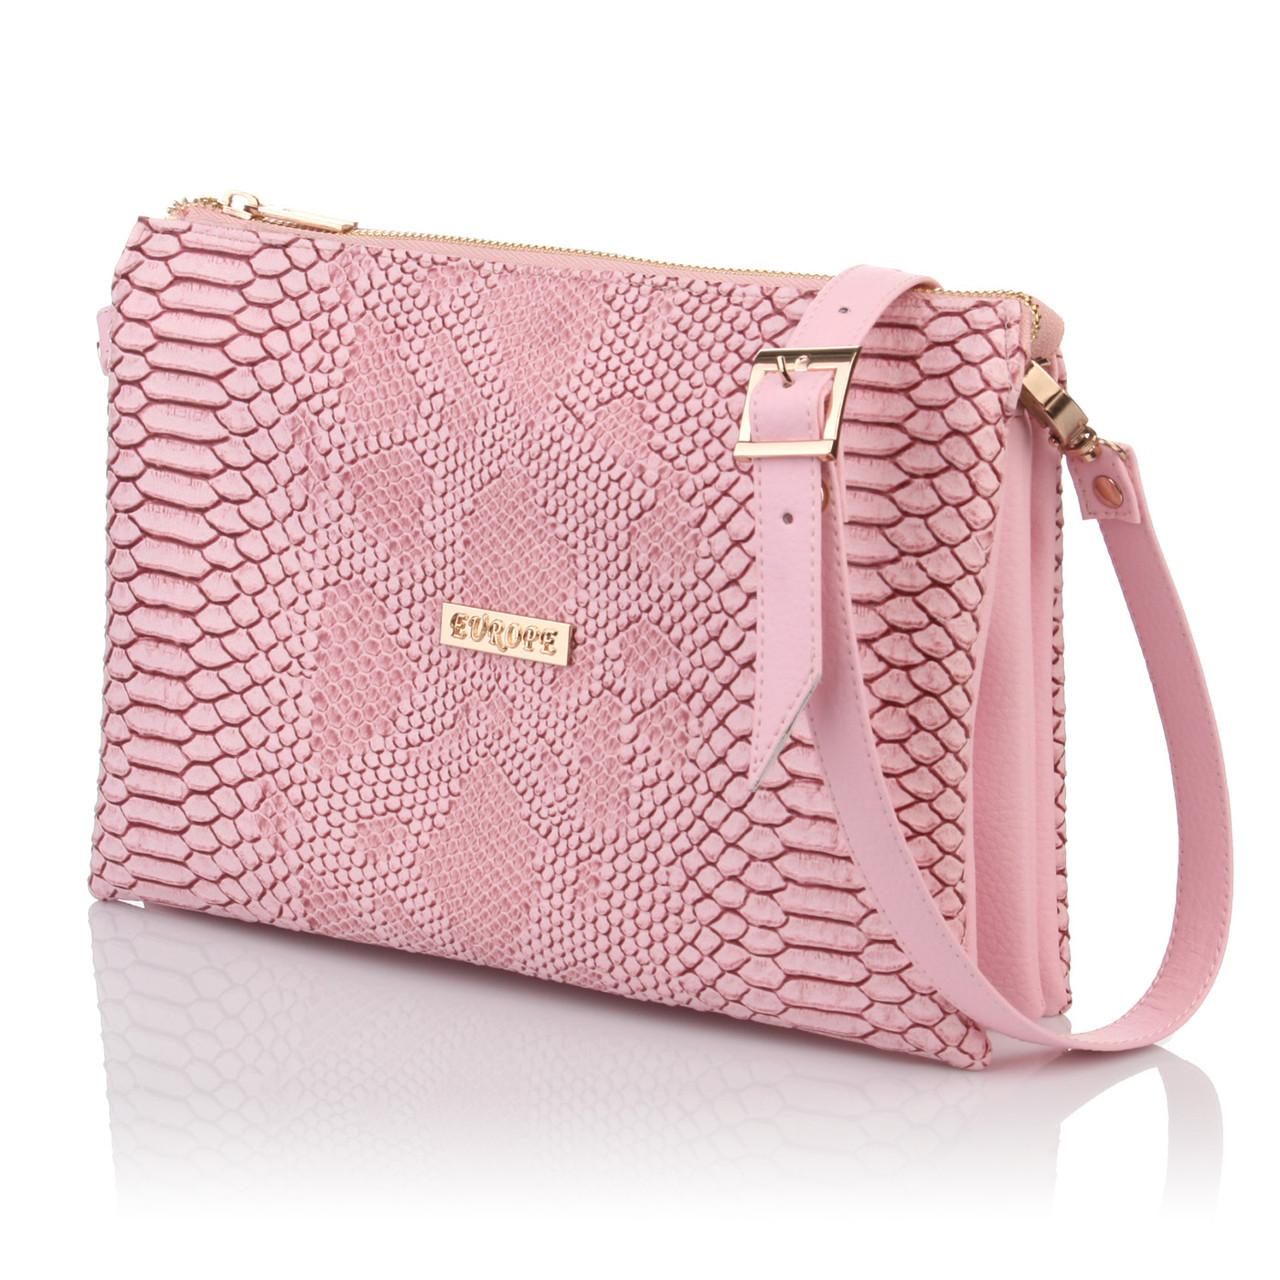 Розовая сумочка-клатч имитация кожи змеи - Интернет магазин сумок SUMKOFF -  женские и мужские 8bb1ff61e02